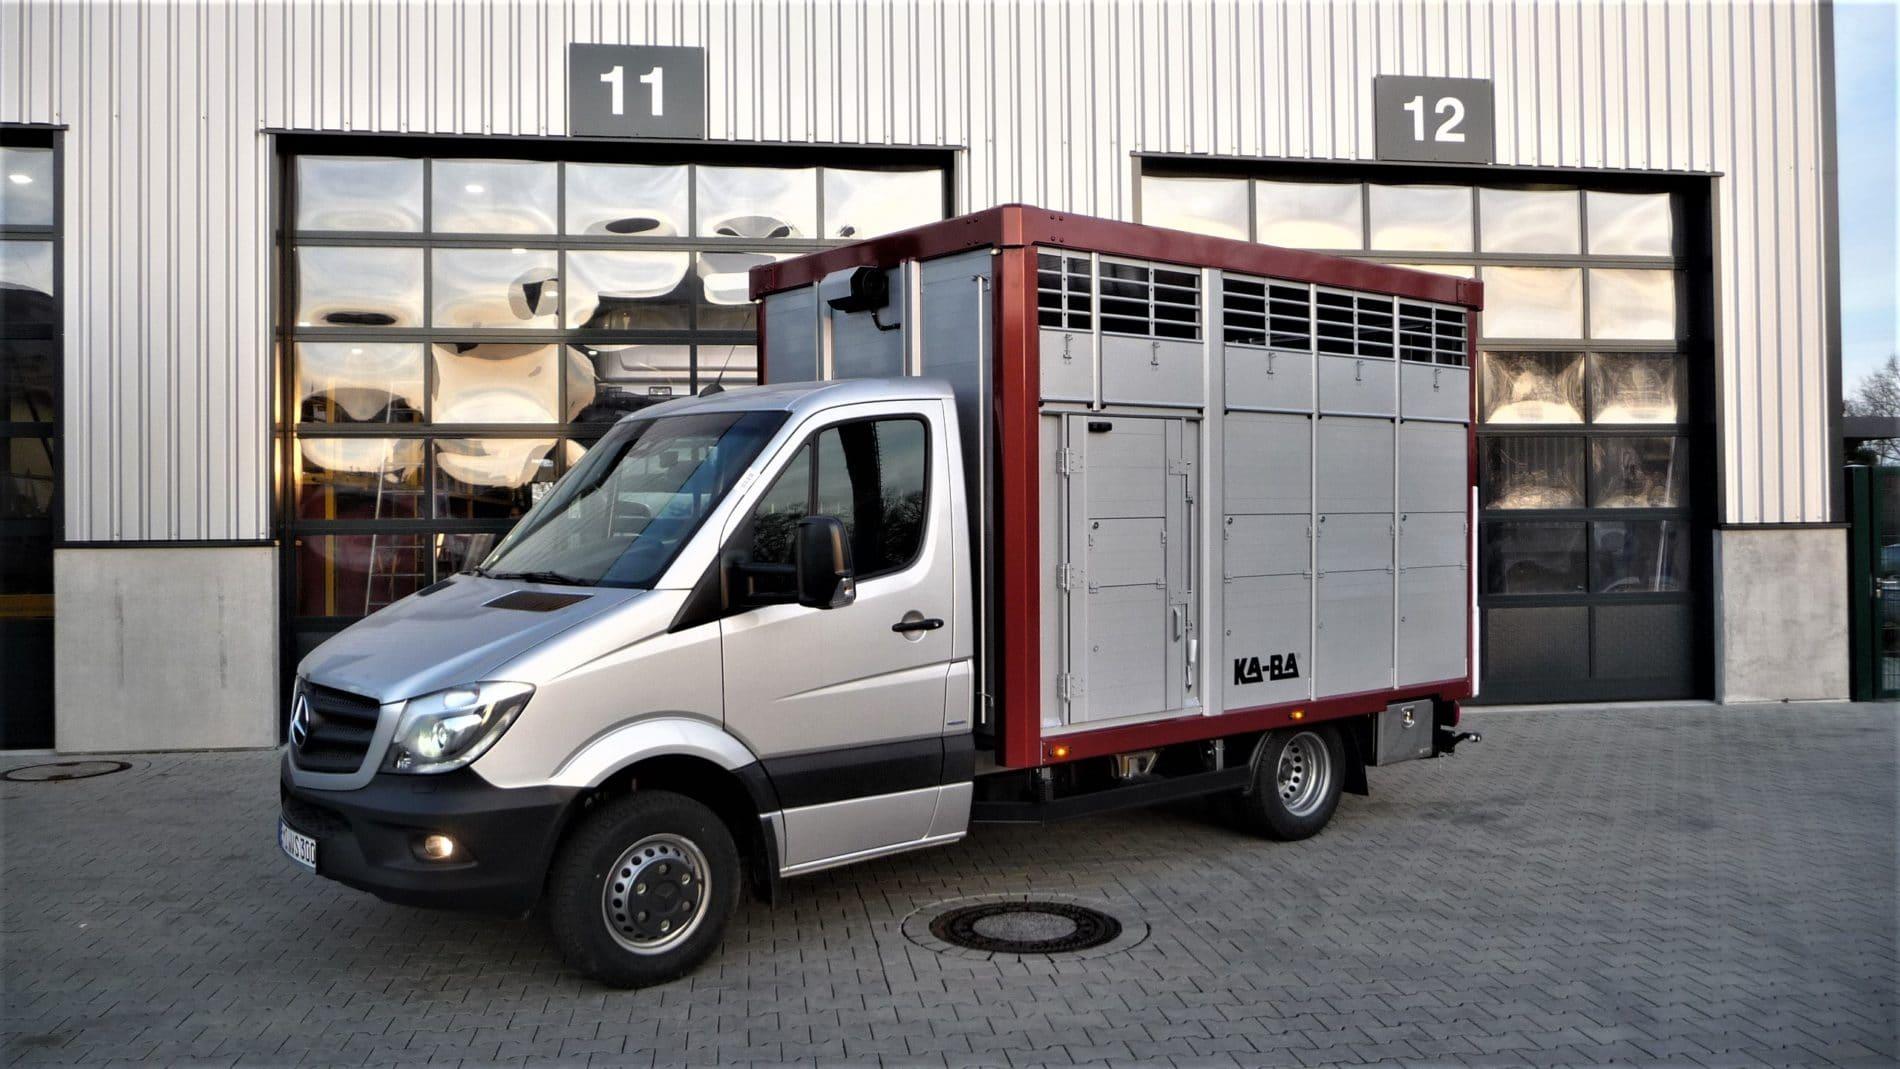 Kaba Einstockfahrzeug Bild01